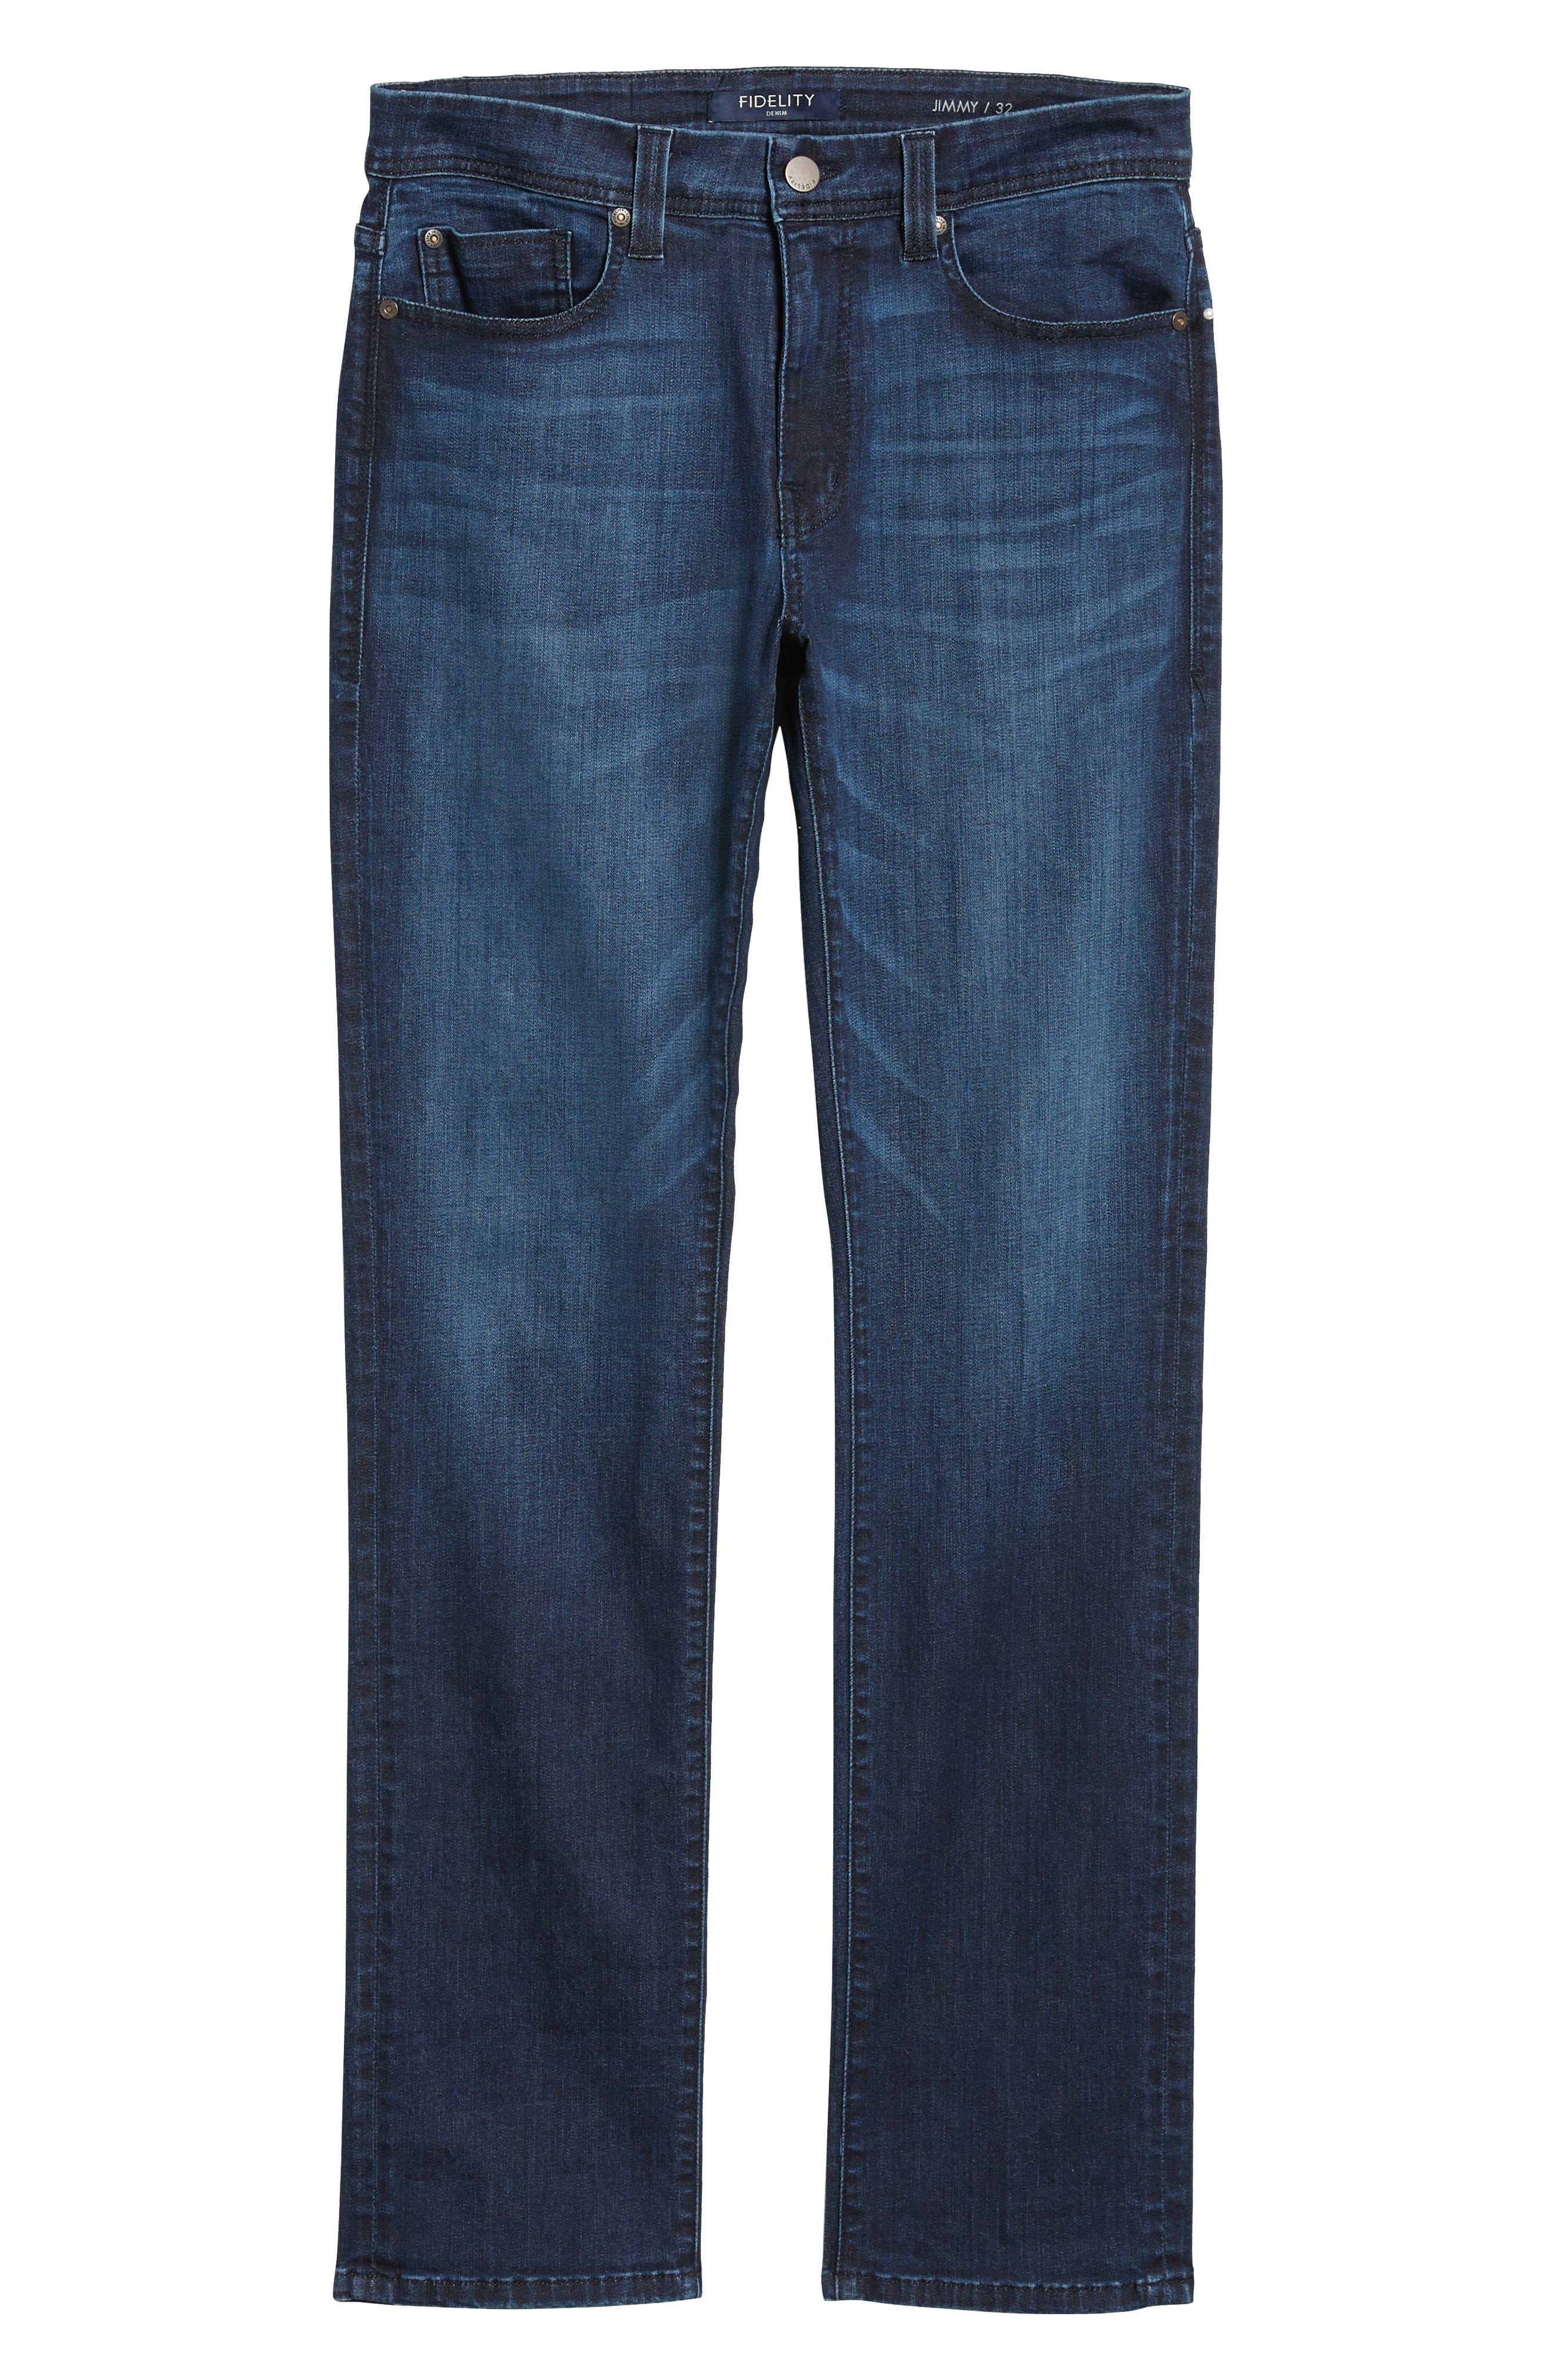 Jimmy Slim Straight Leg Jeans,                             Alternate thumbnail 6, color,                             400